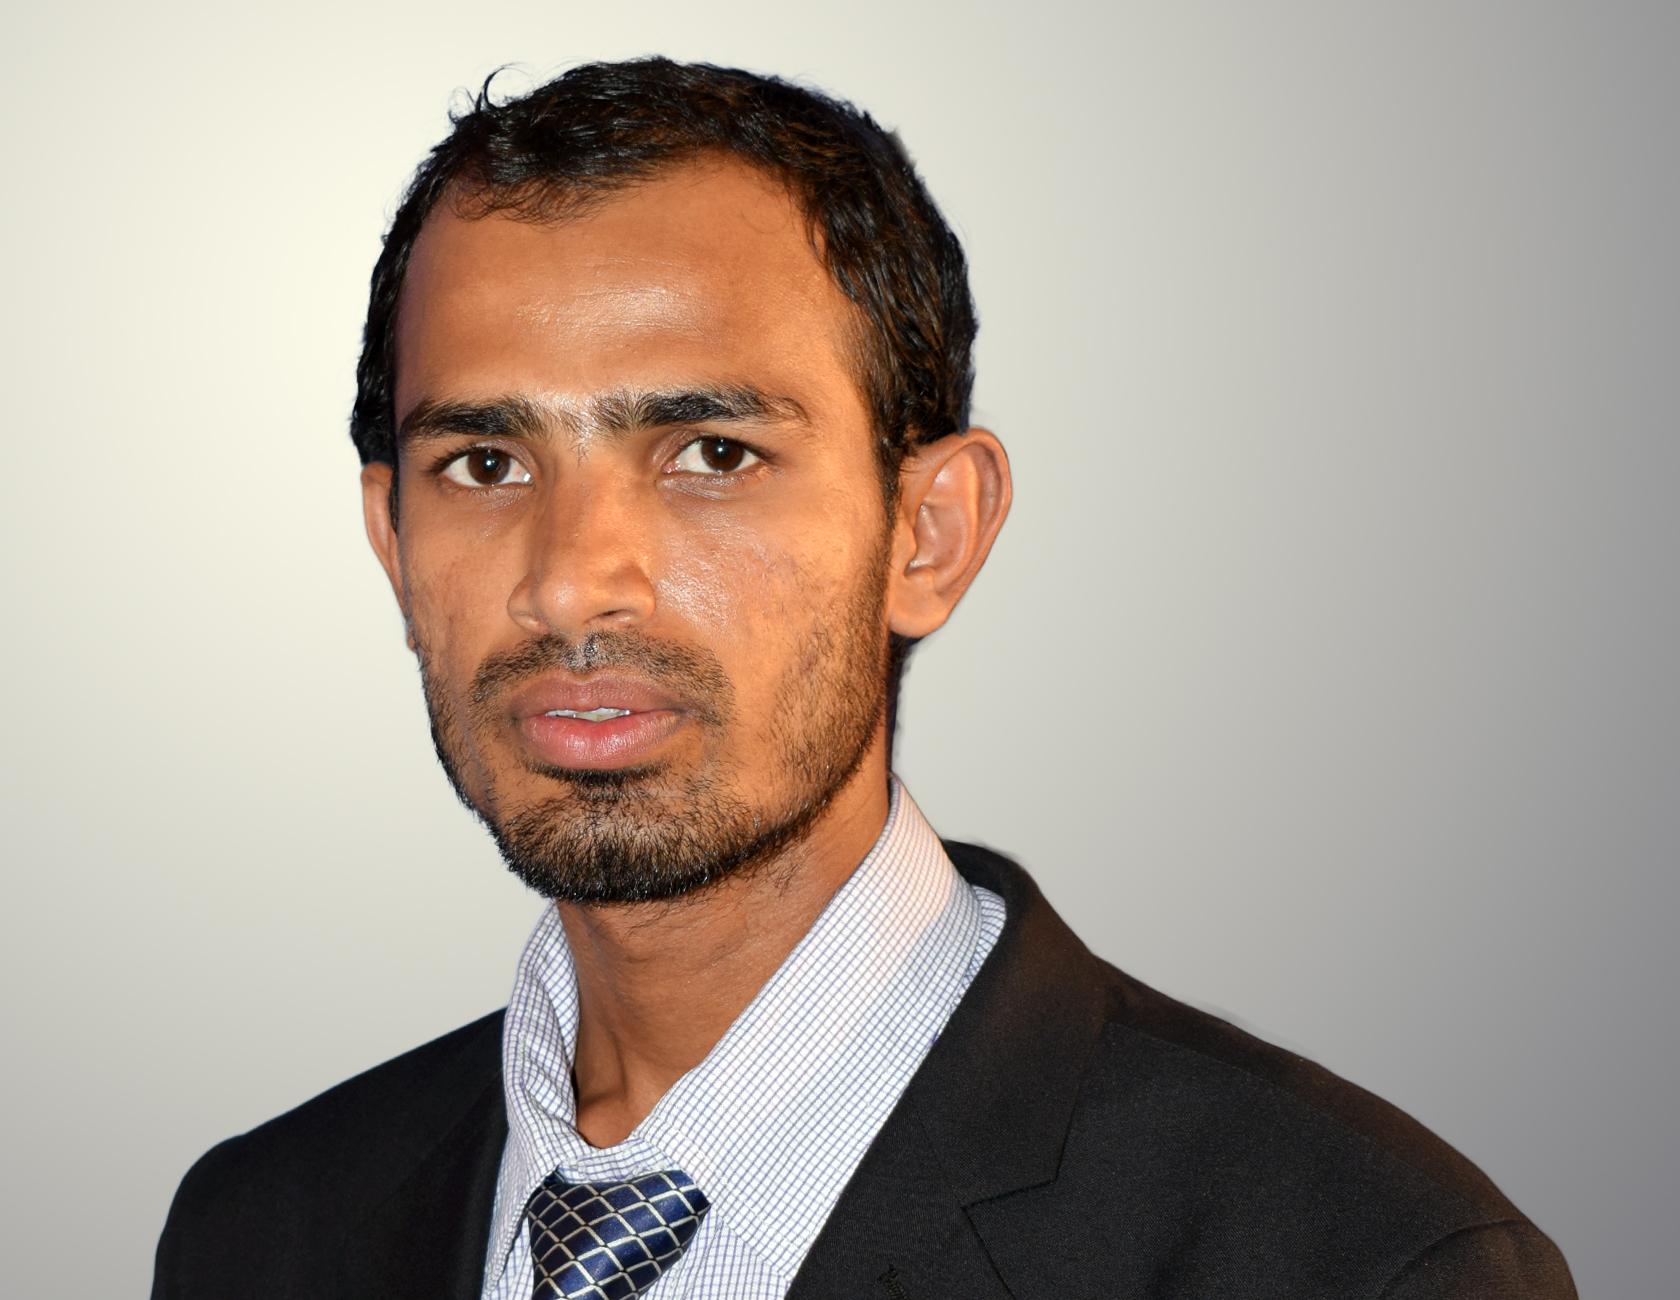 Abdul-Kaleem